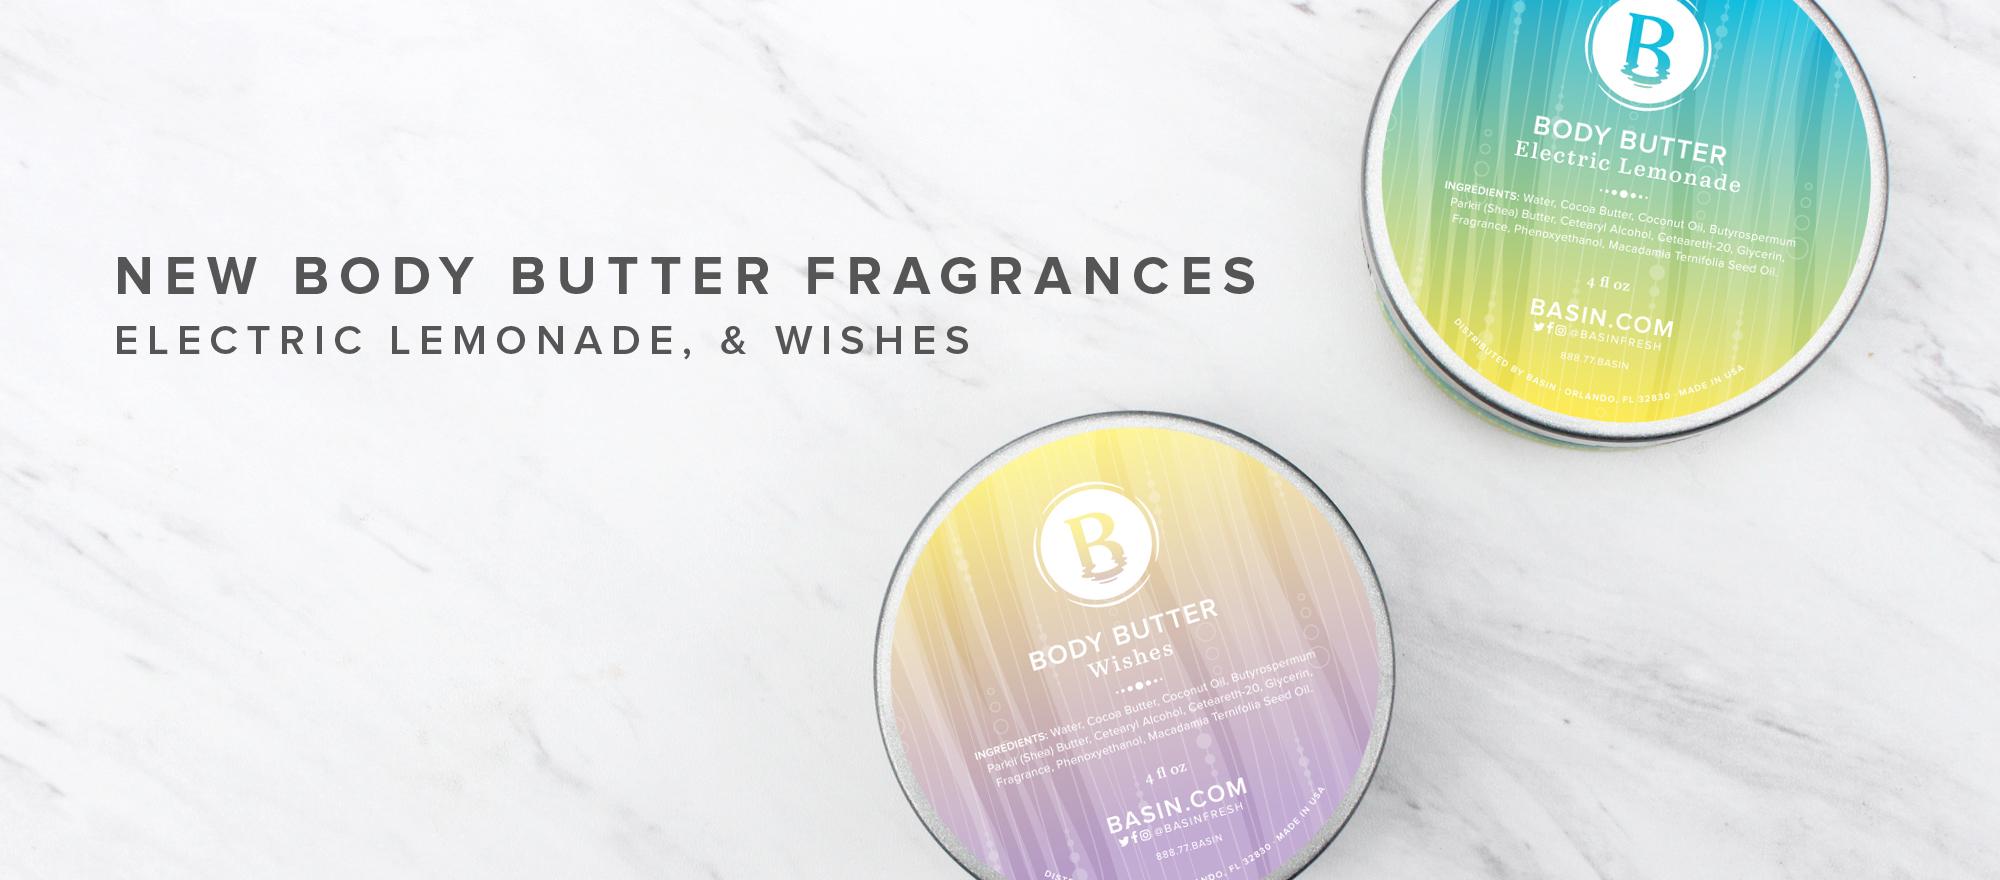 New Body Butter Fragrances